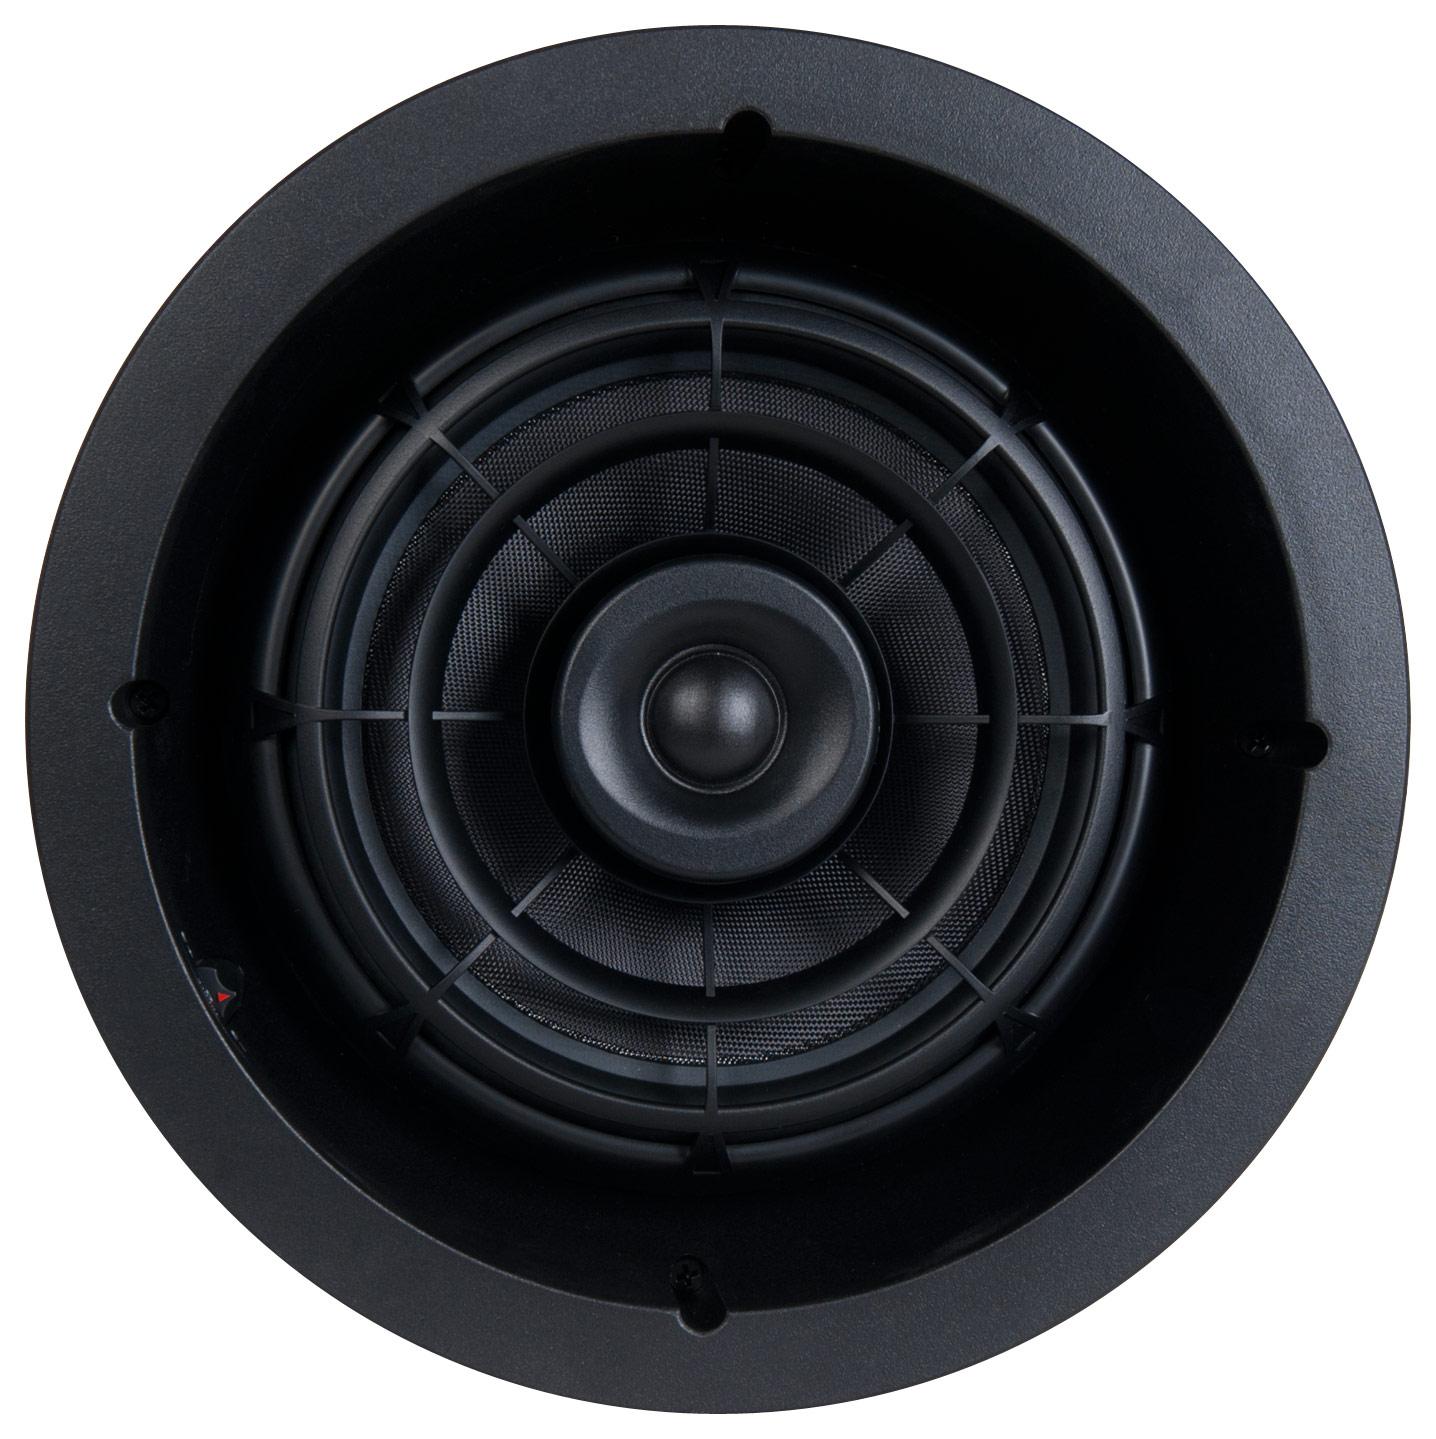 "SpeakerCraft - Profile AIM8 Two 8"" In-Ceiling Speaker (Each) - Black"